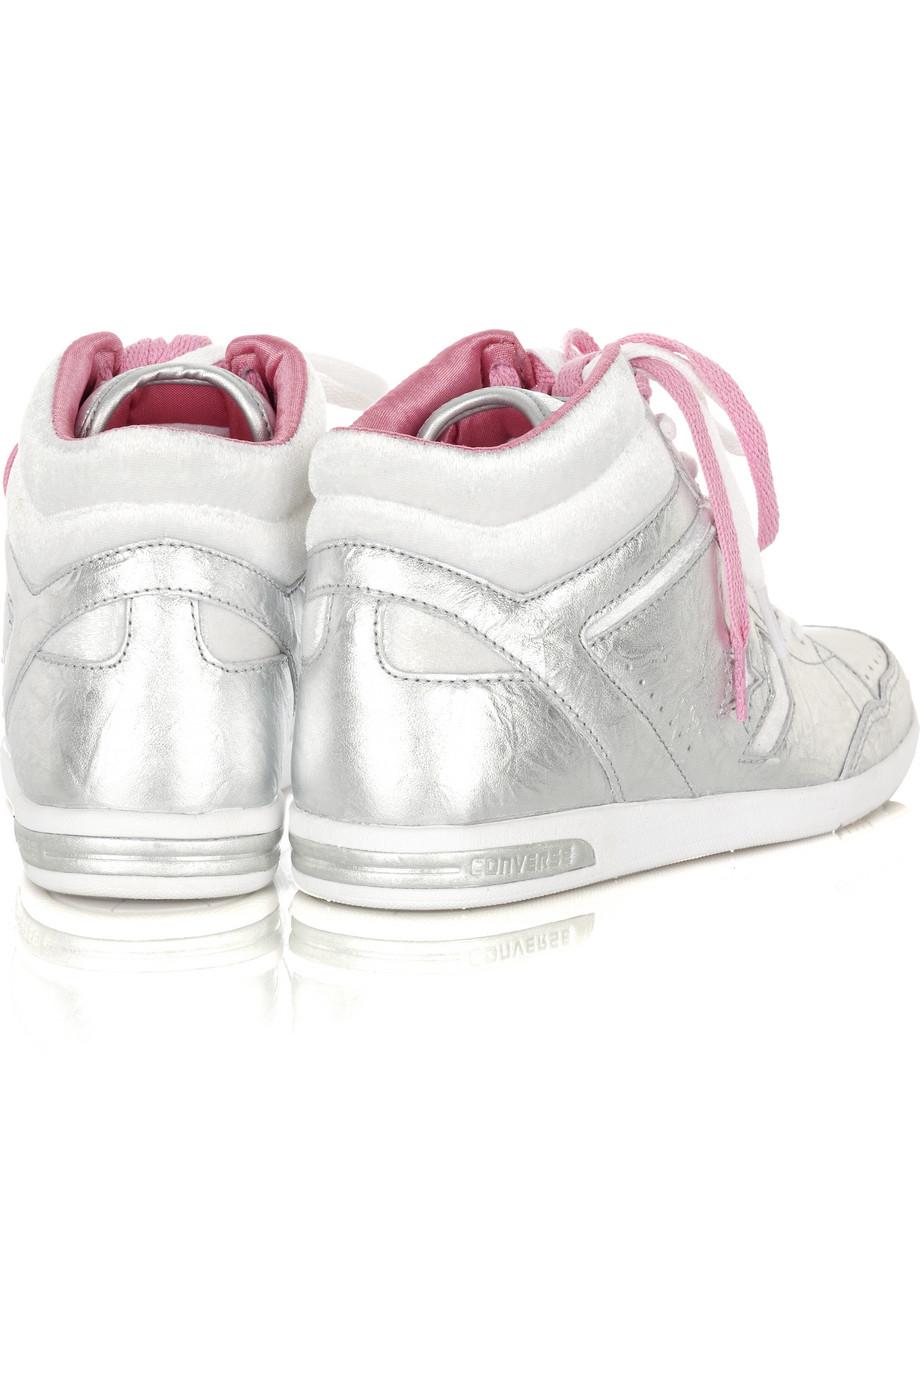 Converse Weapon Hi-top Sneakers in Silver (Metallic)